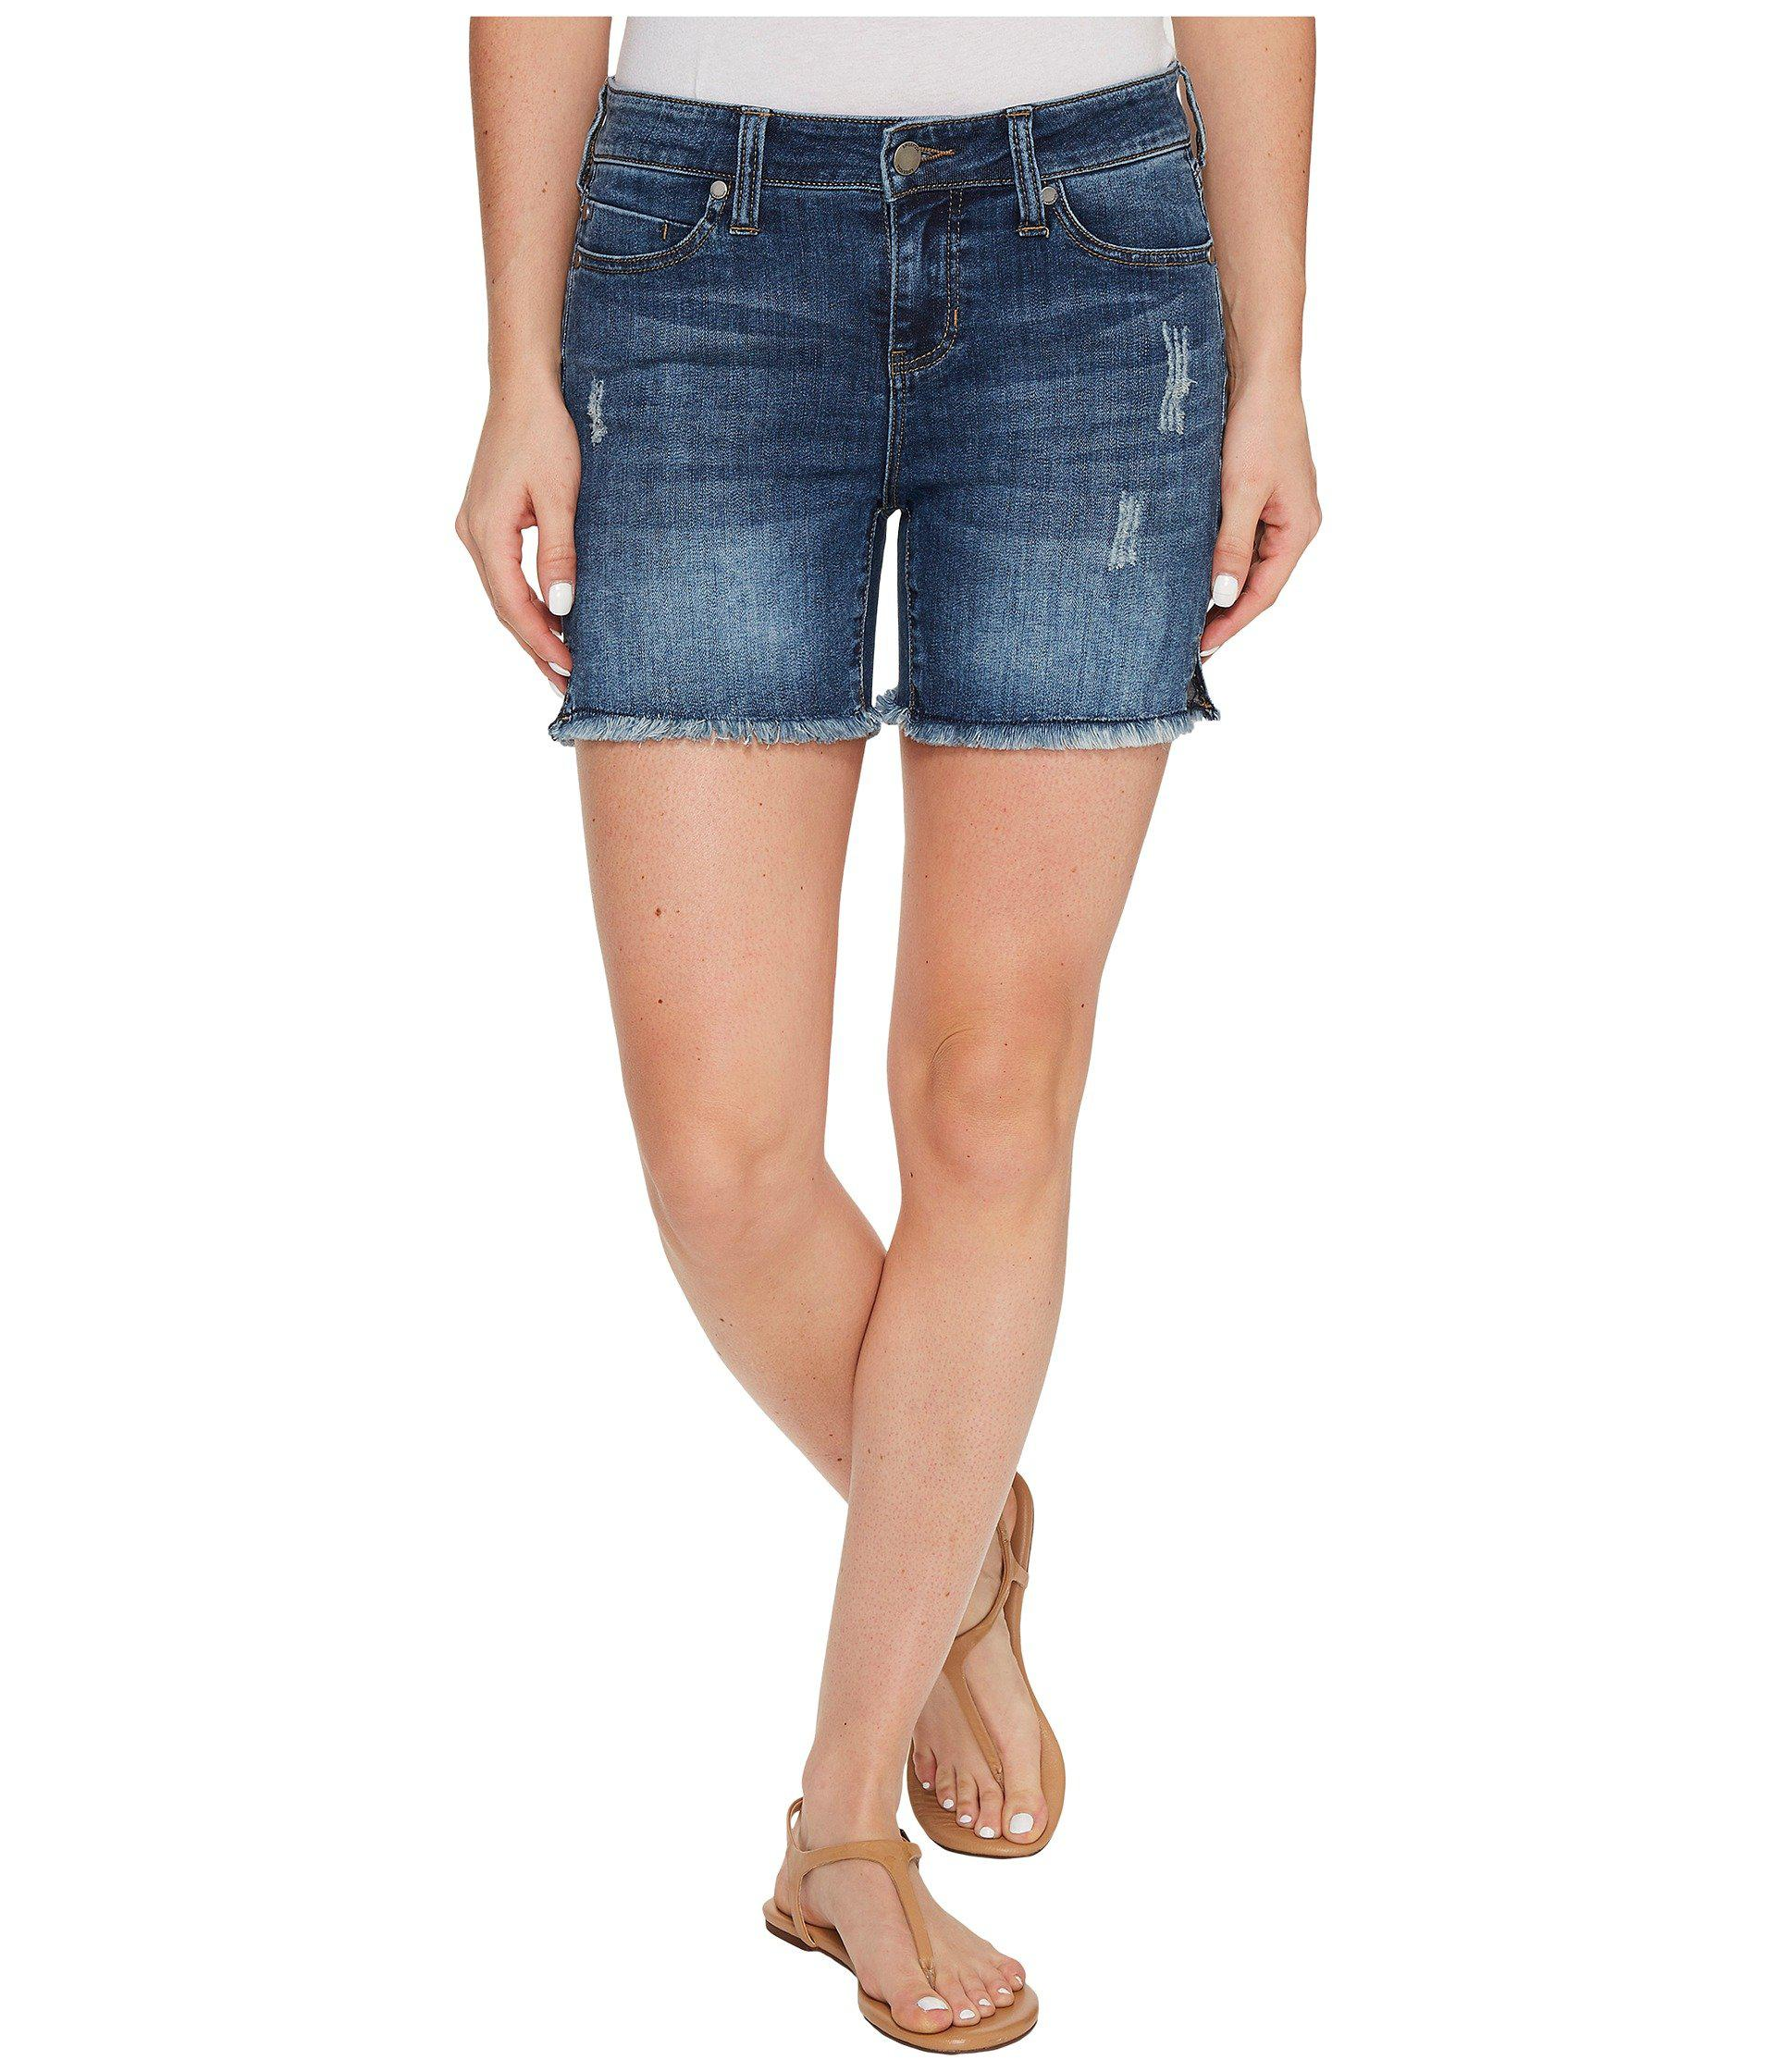 embroidered liverpool comfort cuff bridgeport in comforter capris clothing wide super denim company waist vintage josie stretch lyst jeans